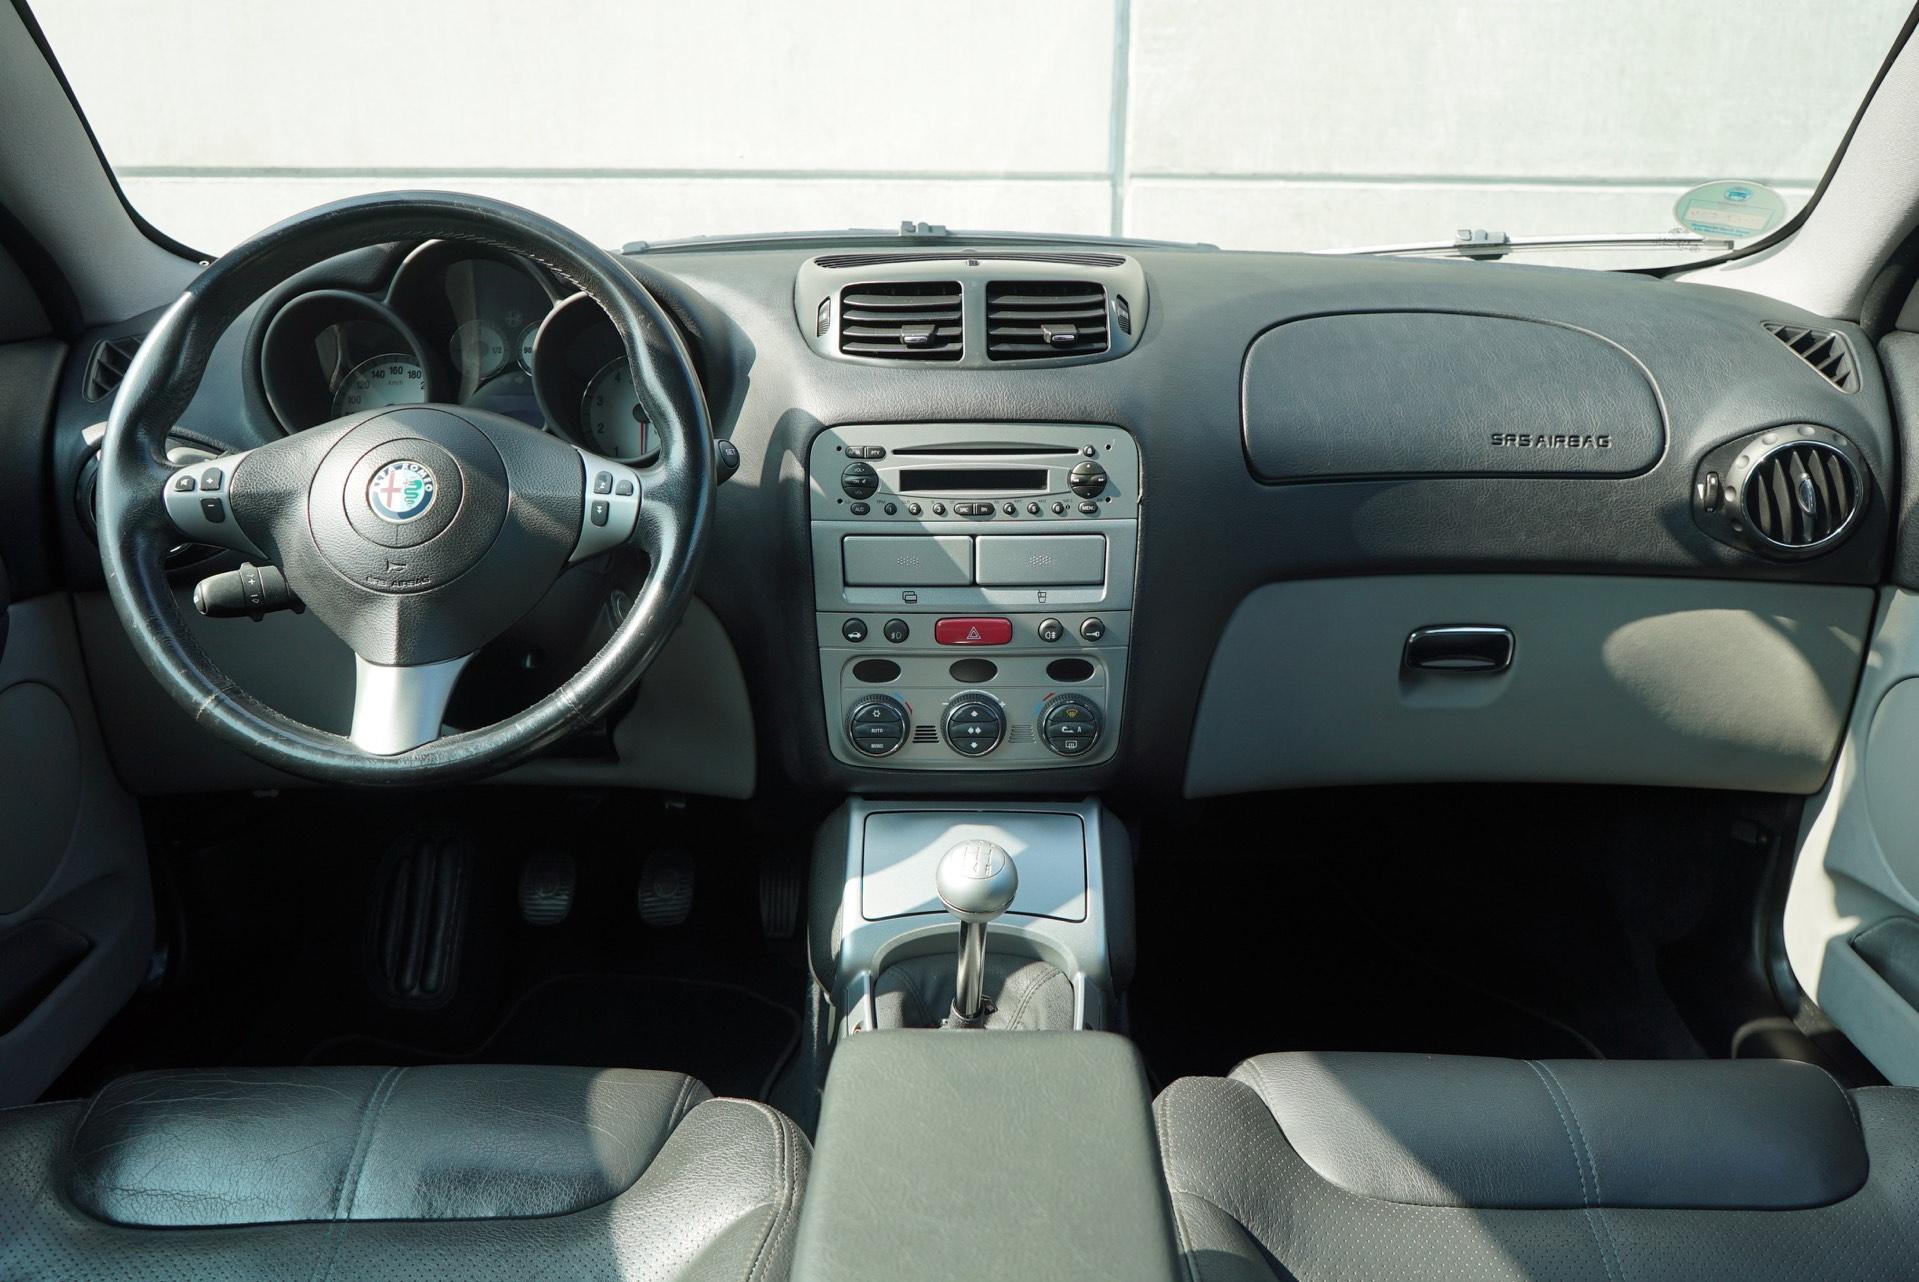 Alfa Romeo Gt 2.0 JTS 16V Distinctive Grigio